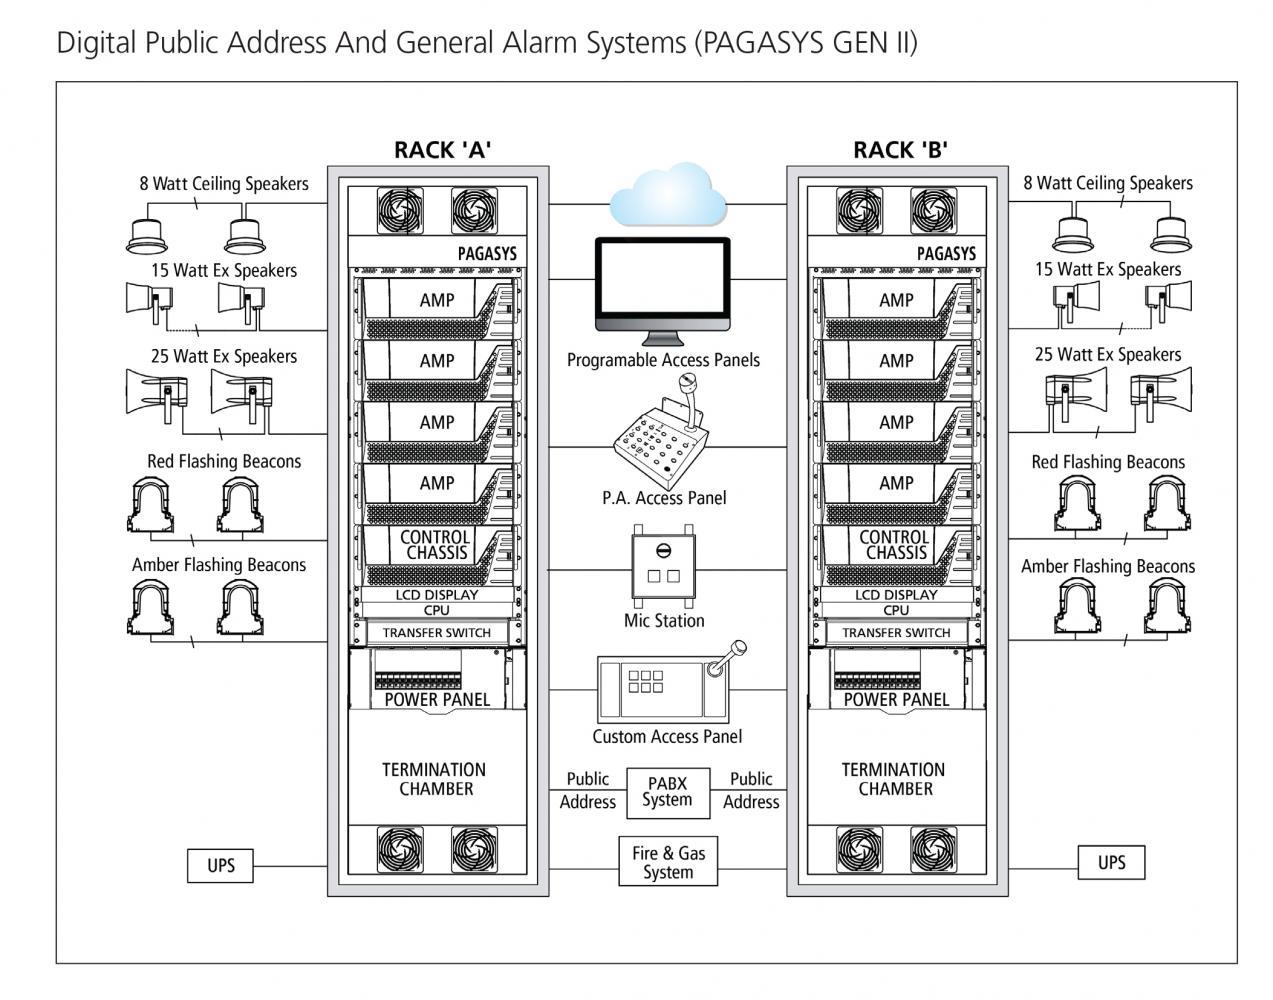 Pagasys Gen Ii Digital Public Address And General Alarm